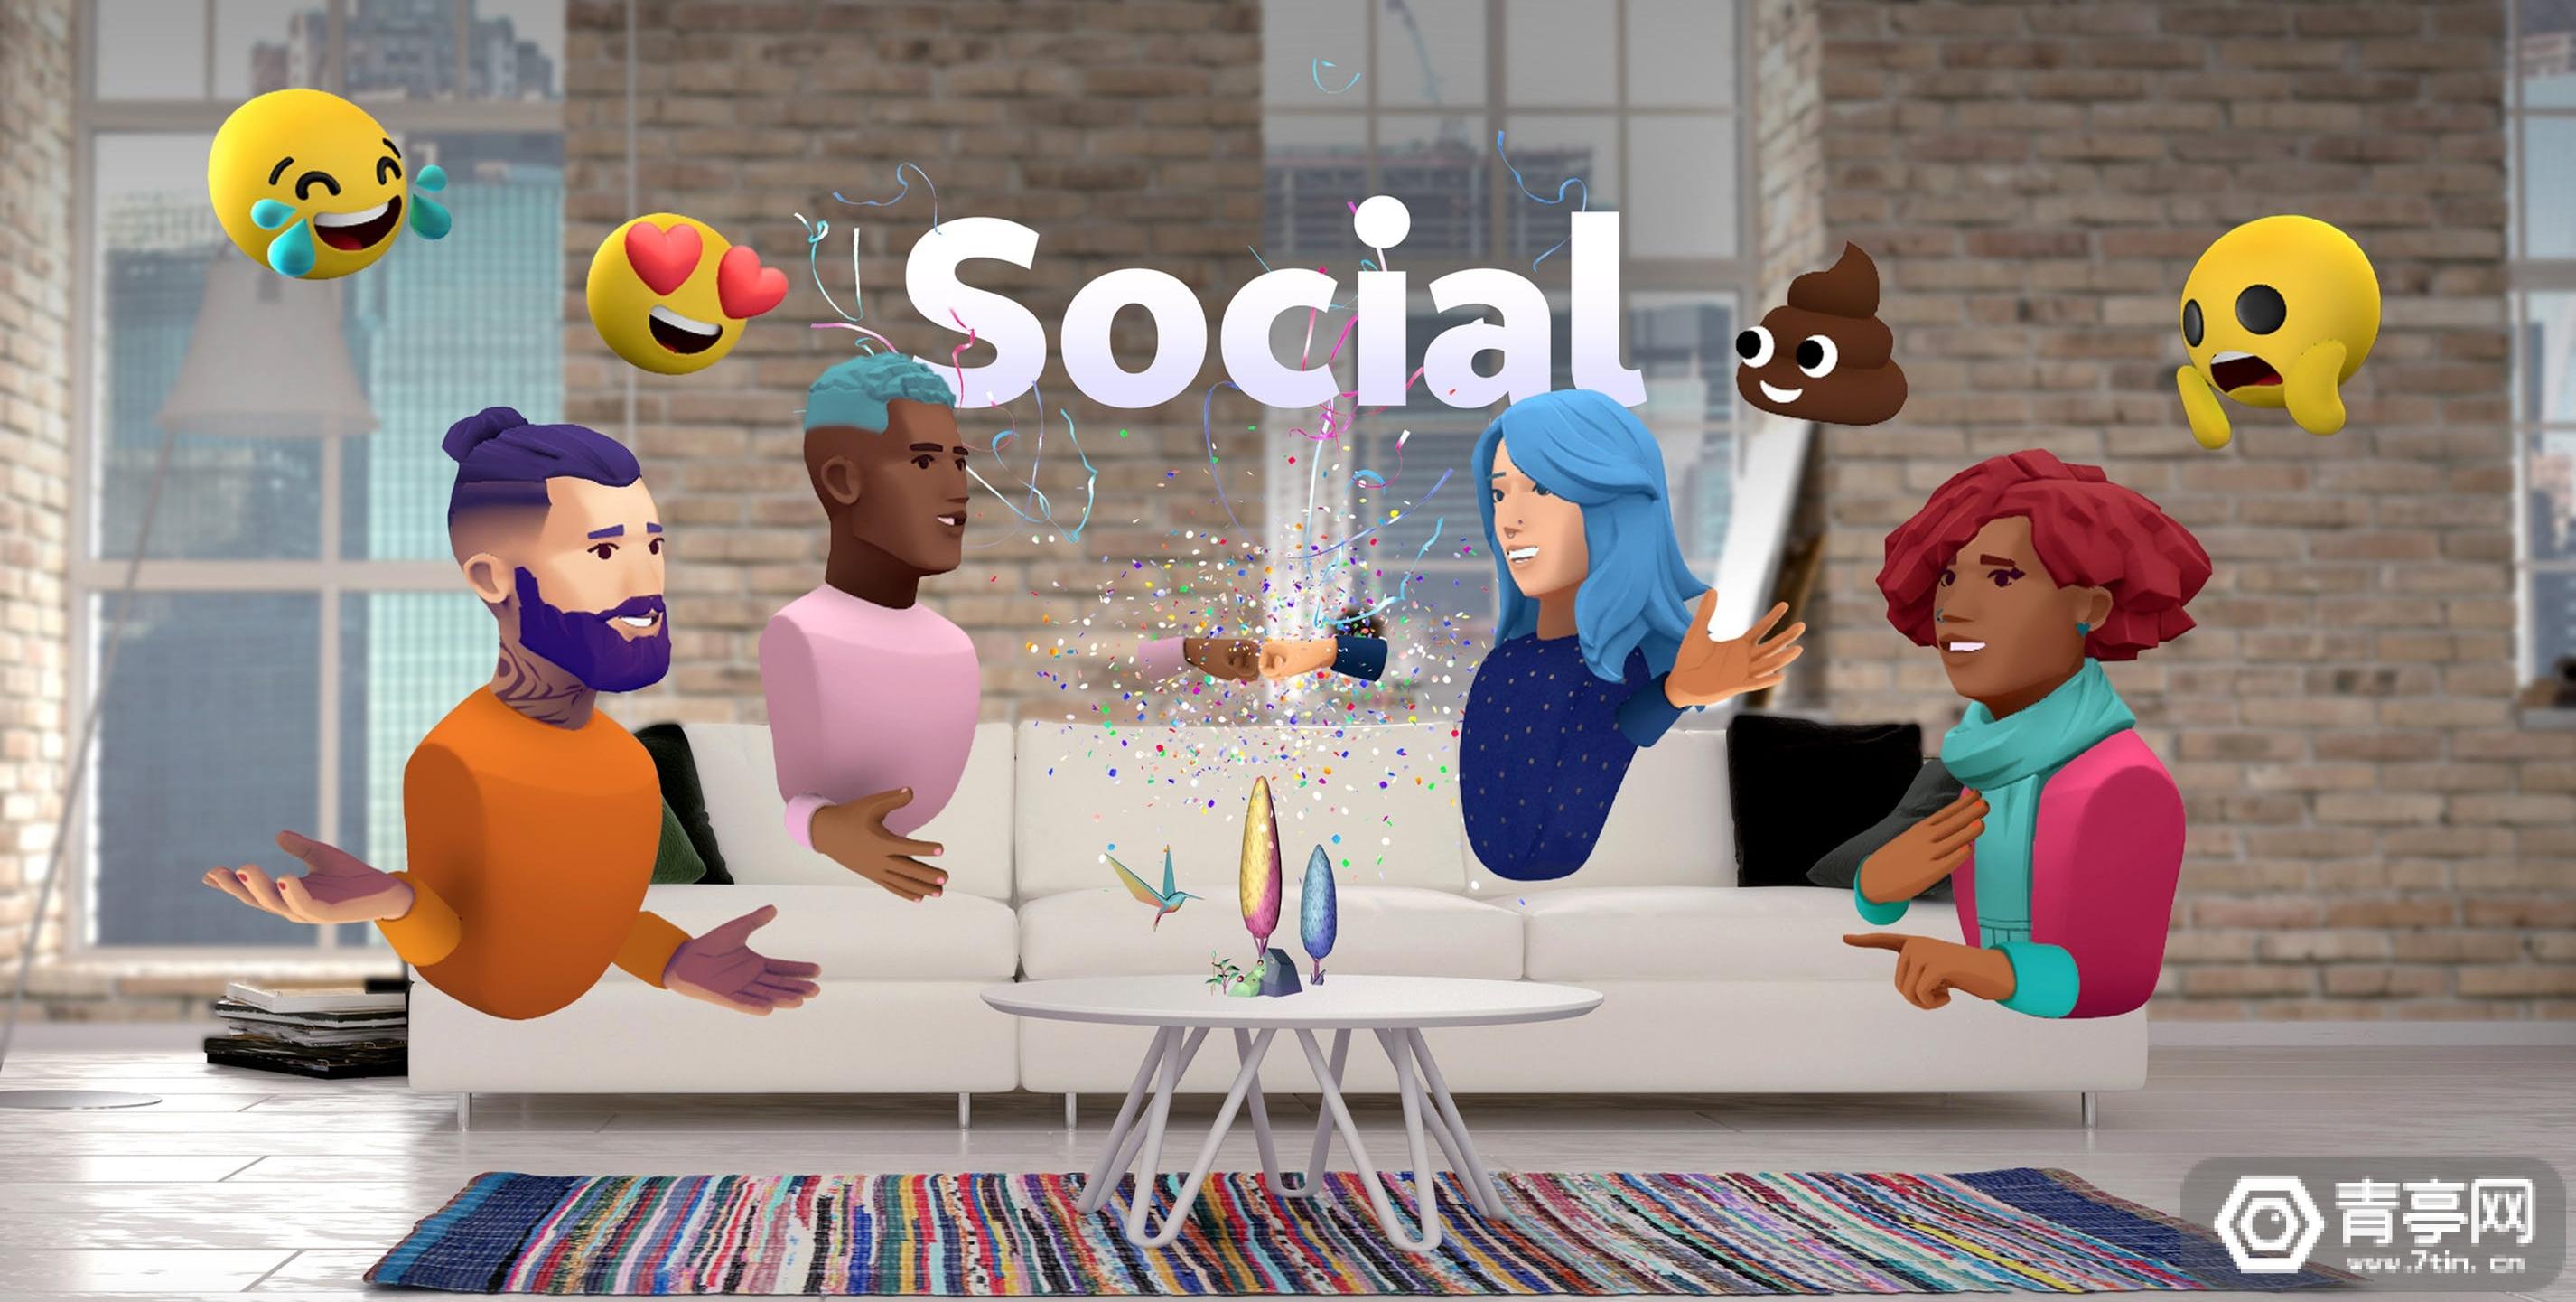 AR社交《Avatar Chat》体验:能模拟眨眼和表情,和VR大同小异?